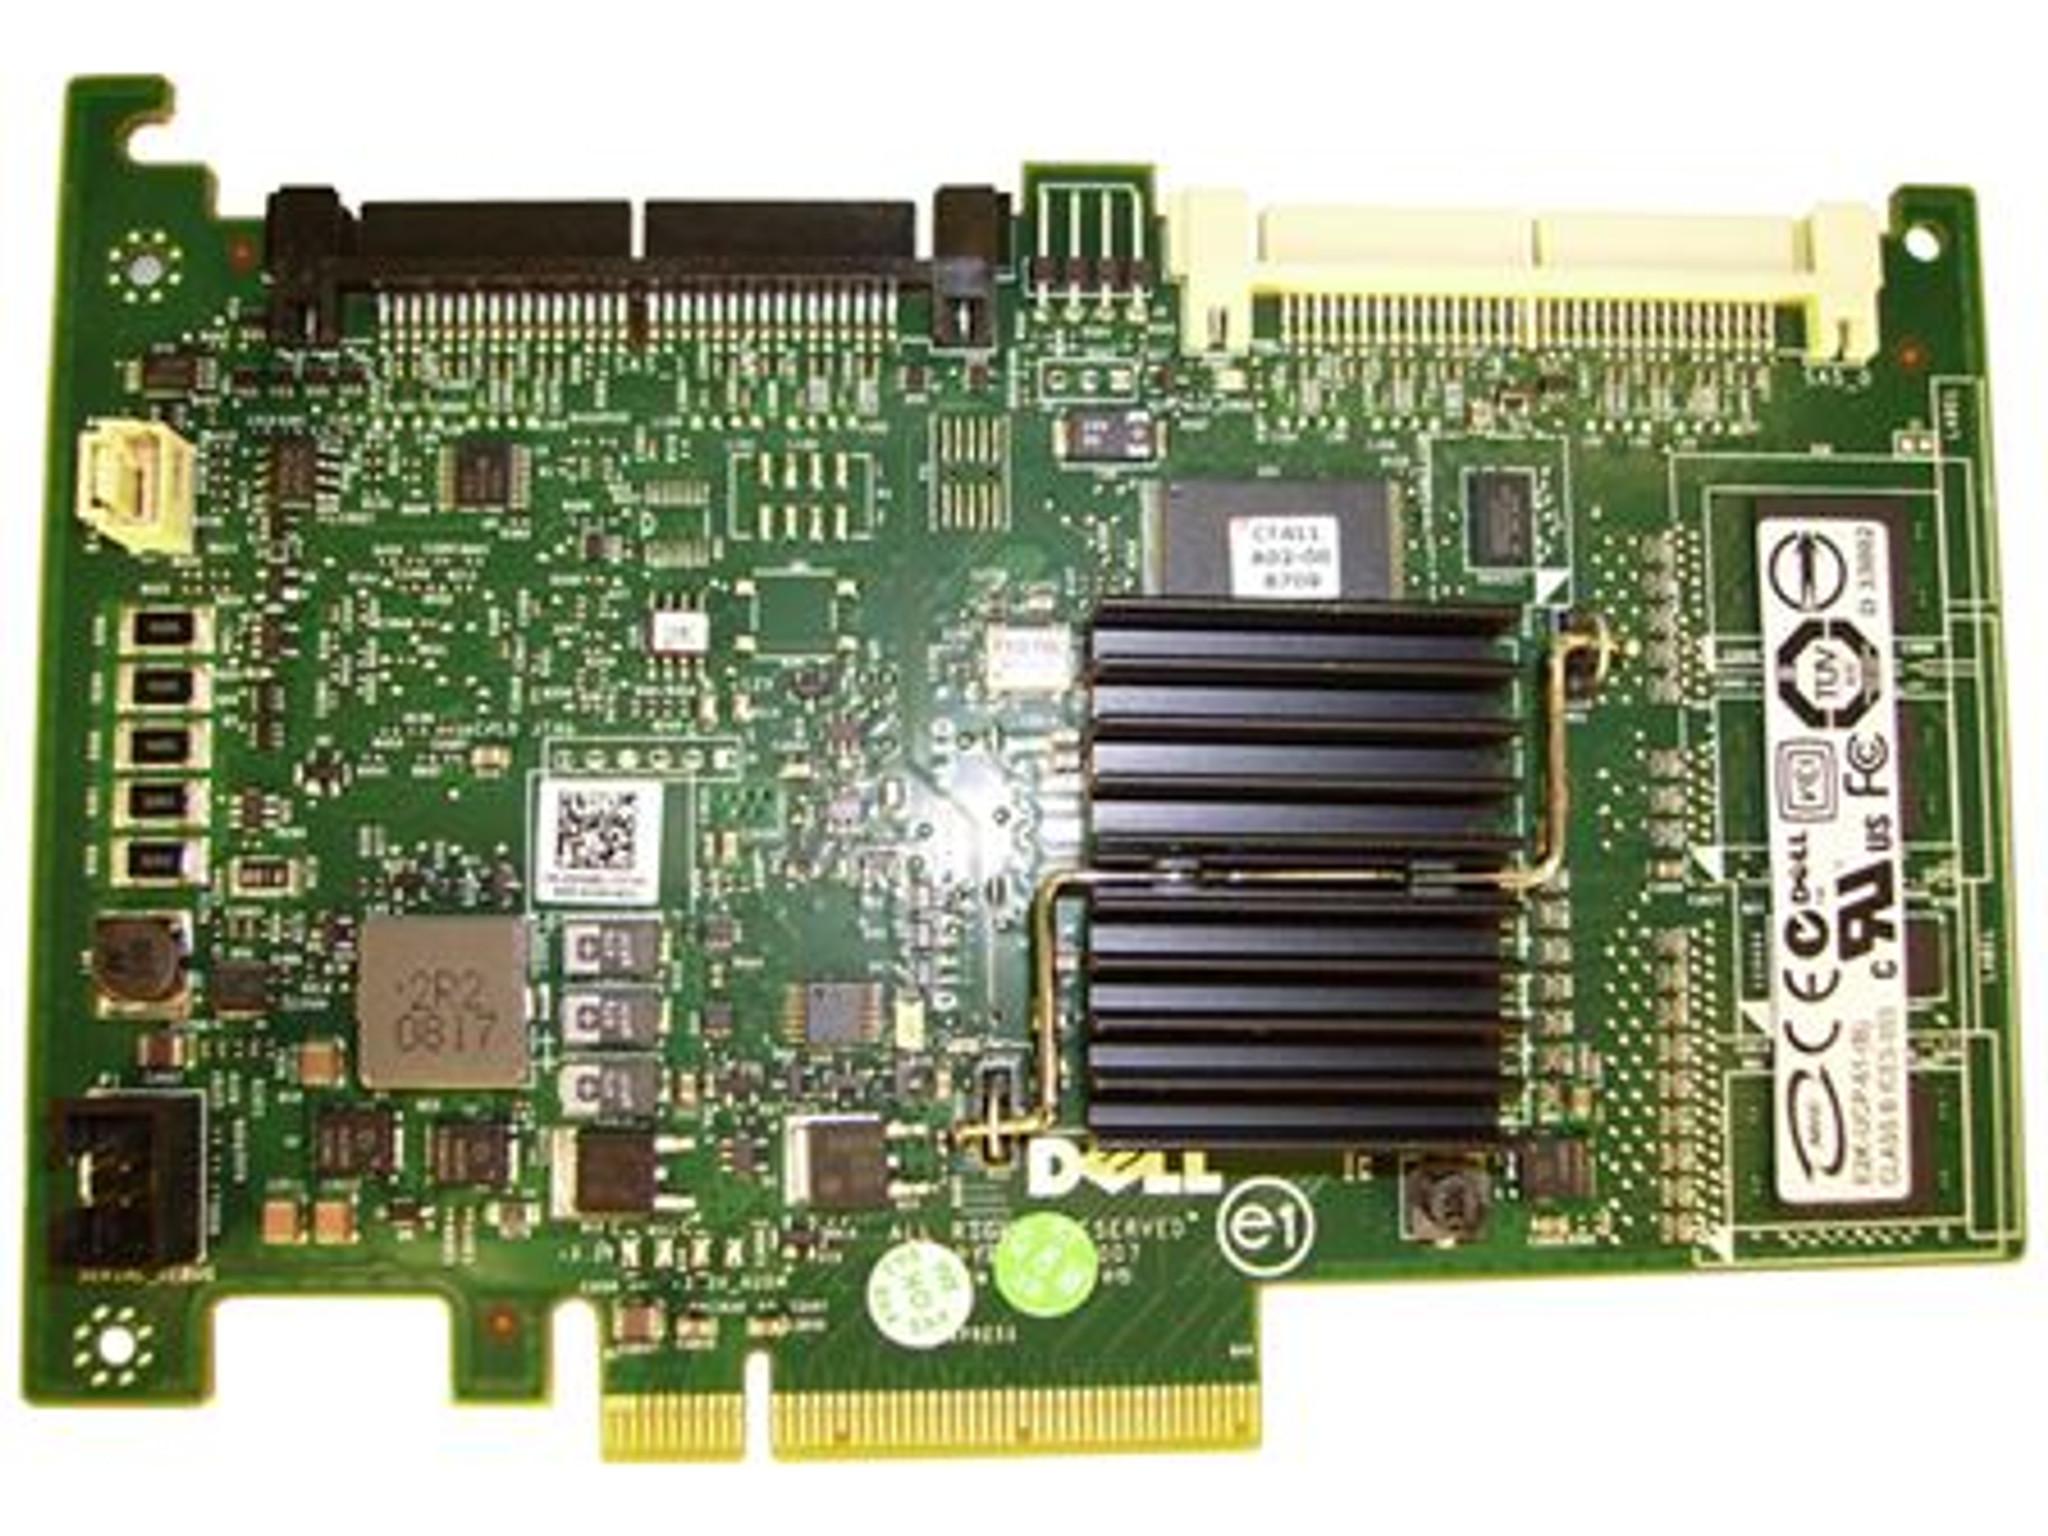 Dell DX481 Perc 6i SAS Raid Controller